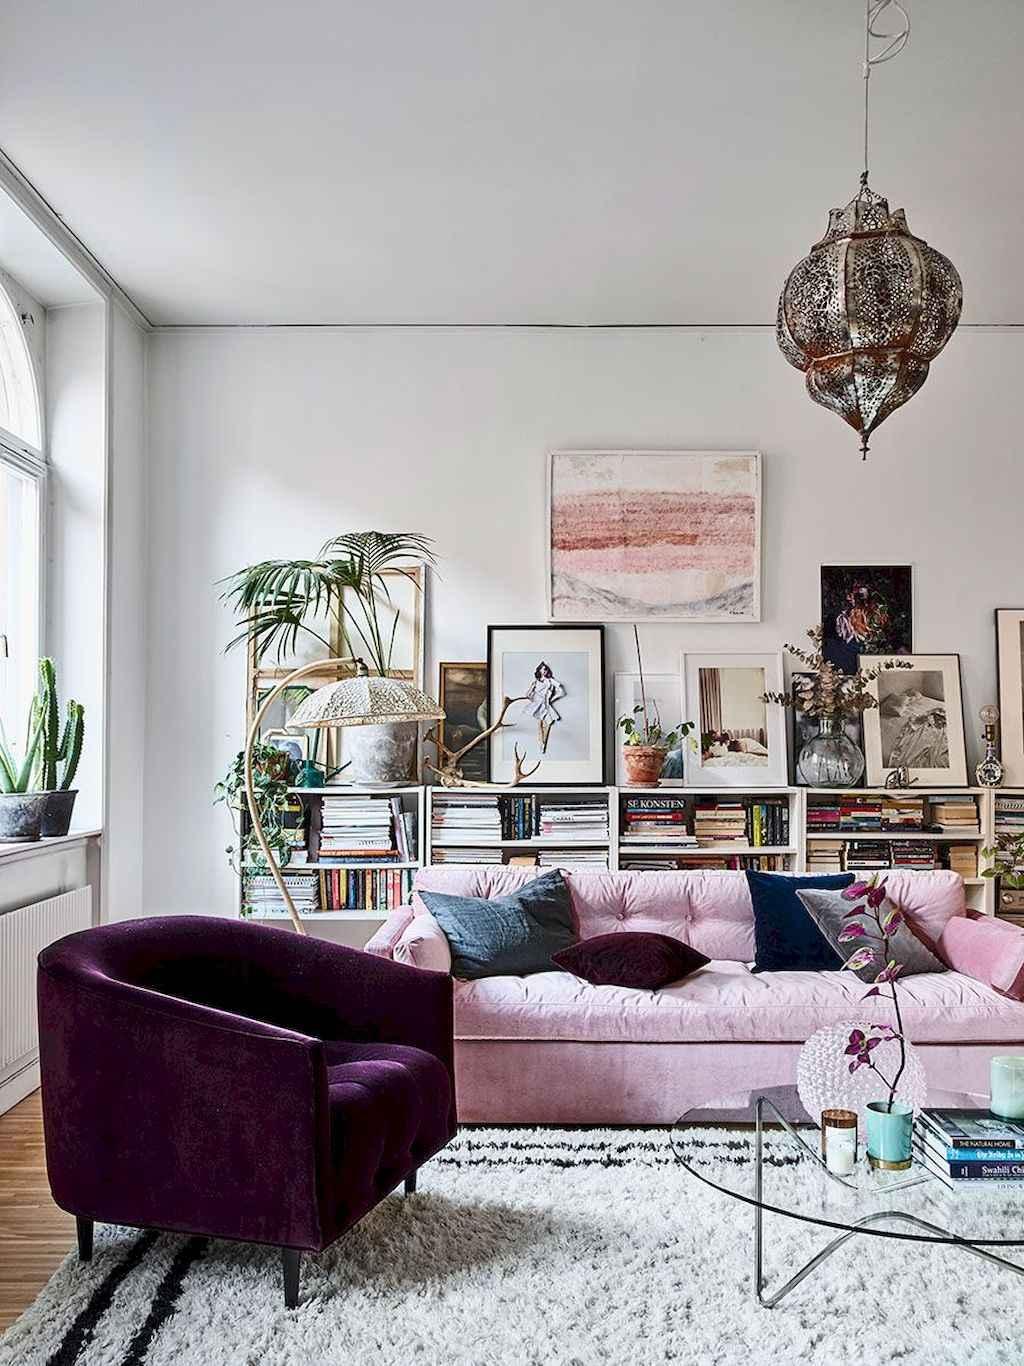 Modern Bohemian Living Room Decor Ideas 61 Homespecially